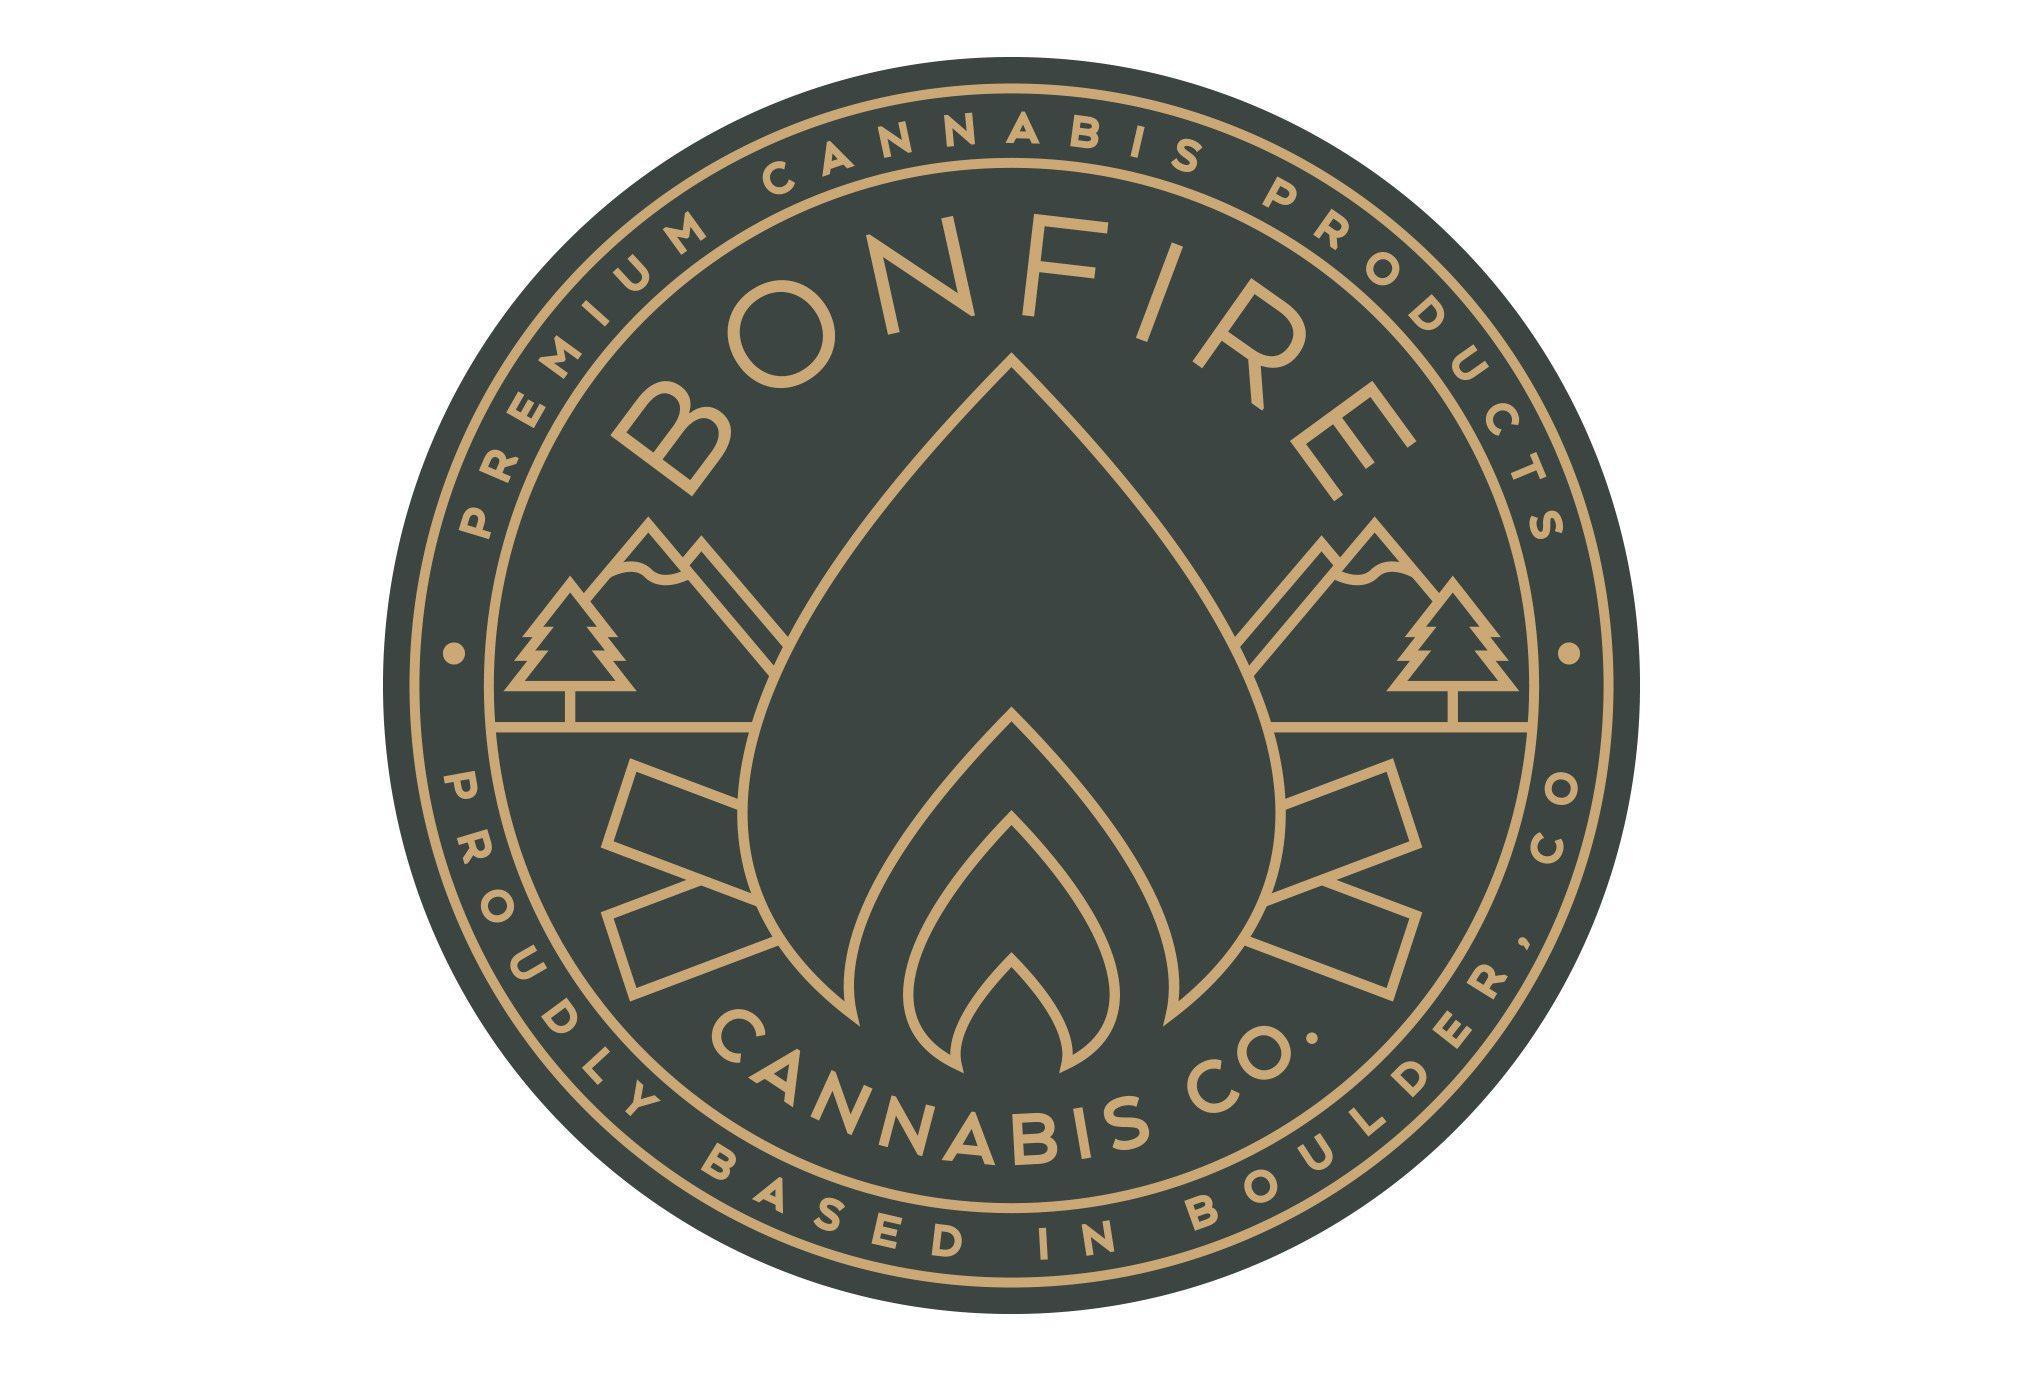 Bonfire Cannabis Co.